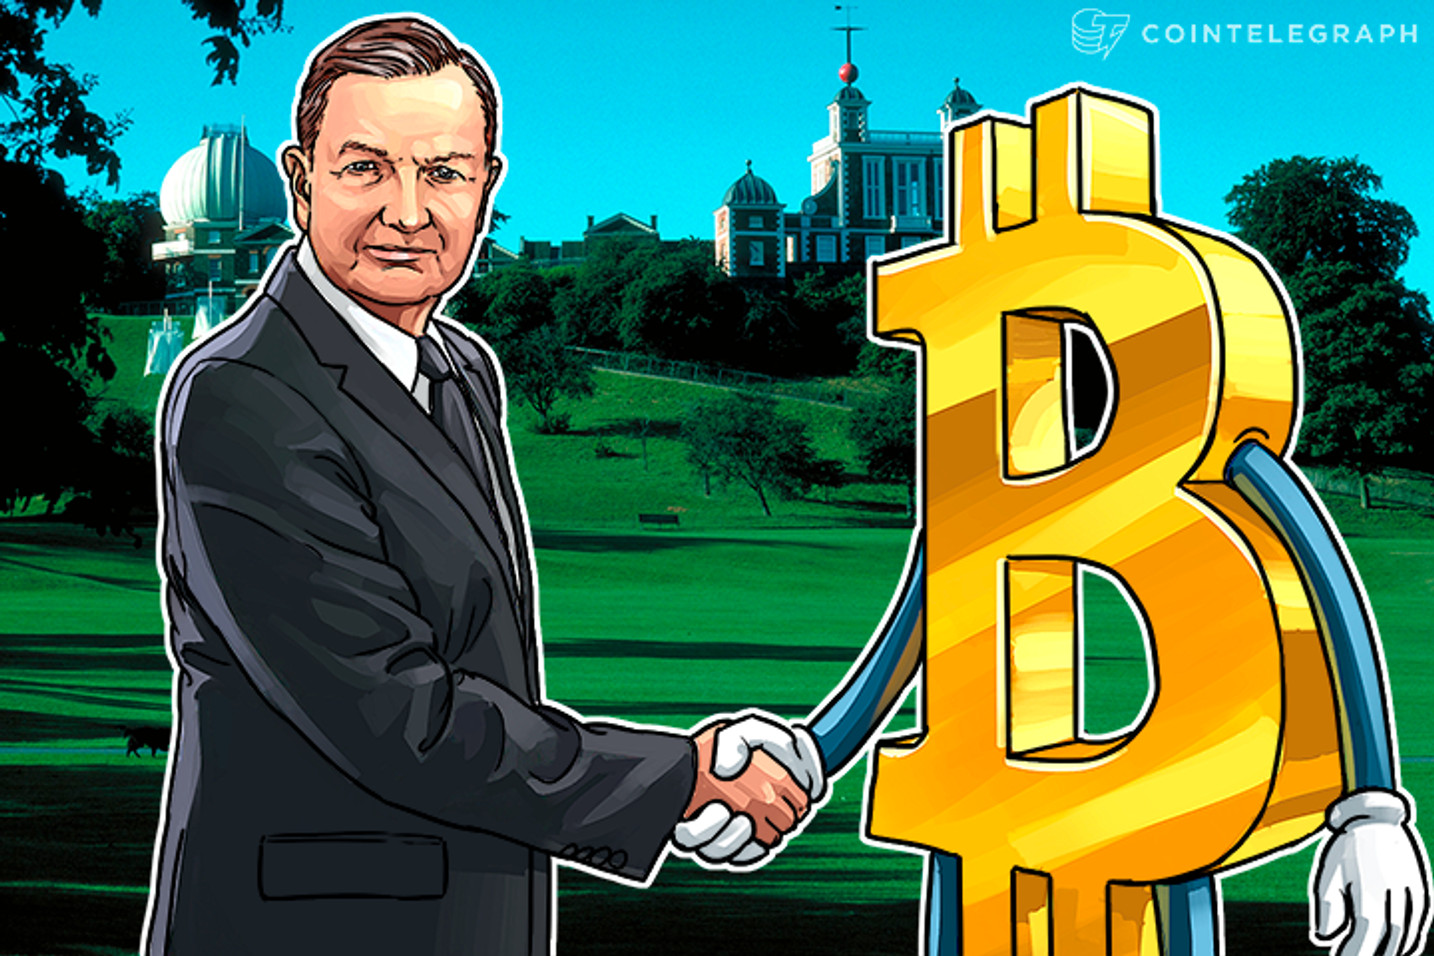 The $1.7 Trillion Reason Banks Prefer Blockchain or Distributed Ledger Over Bitcoin